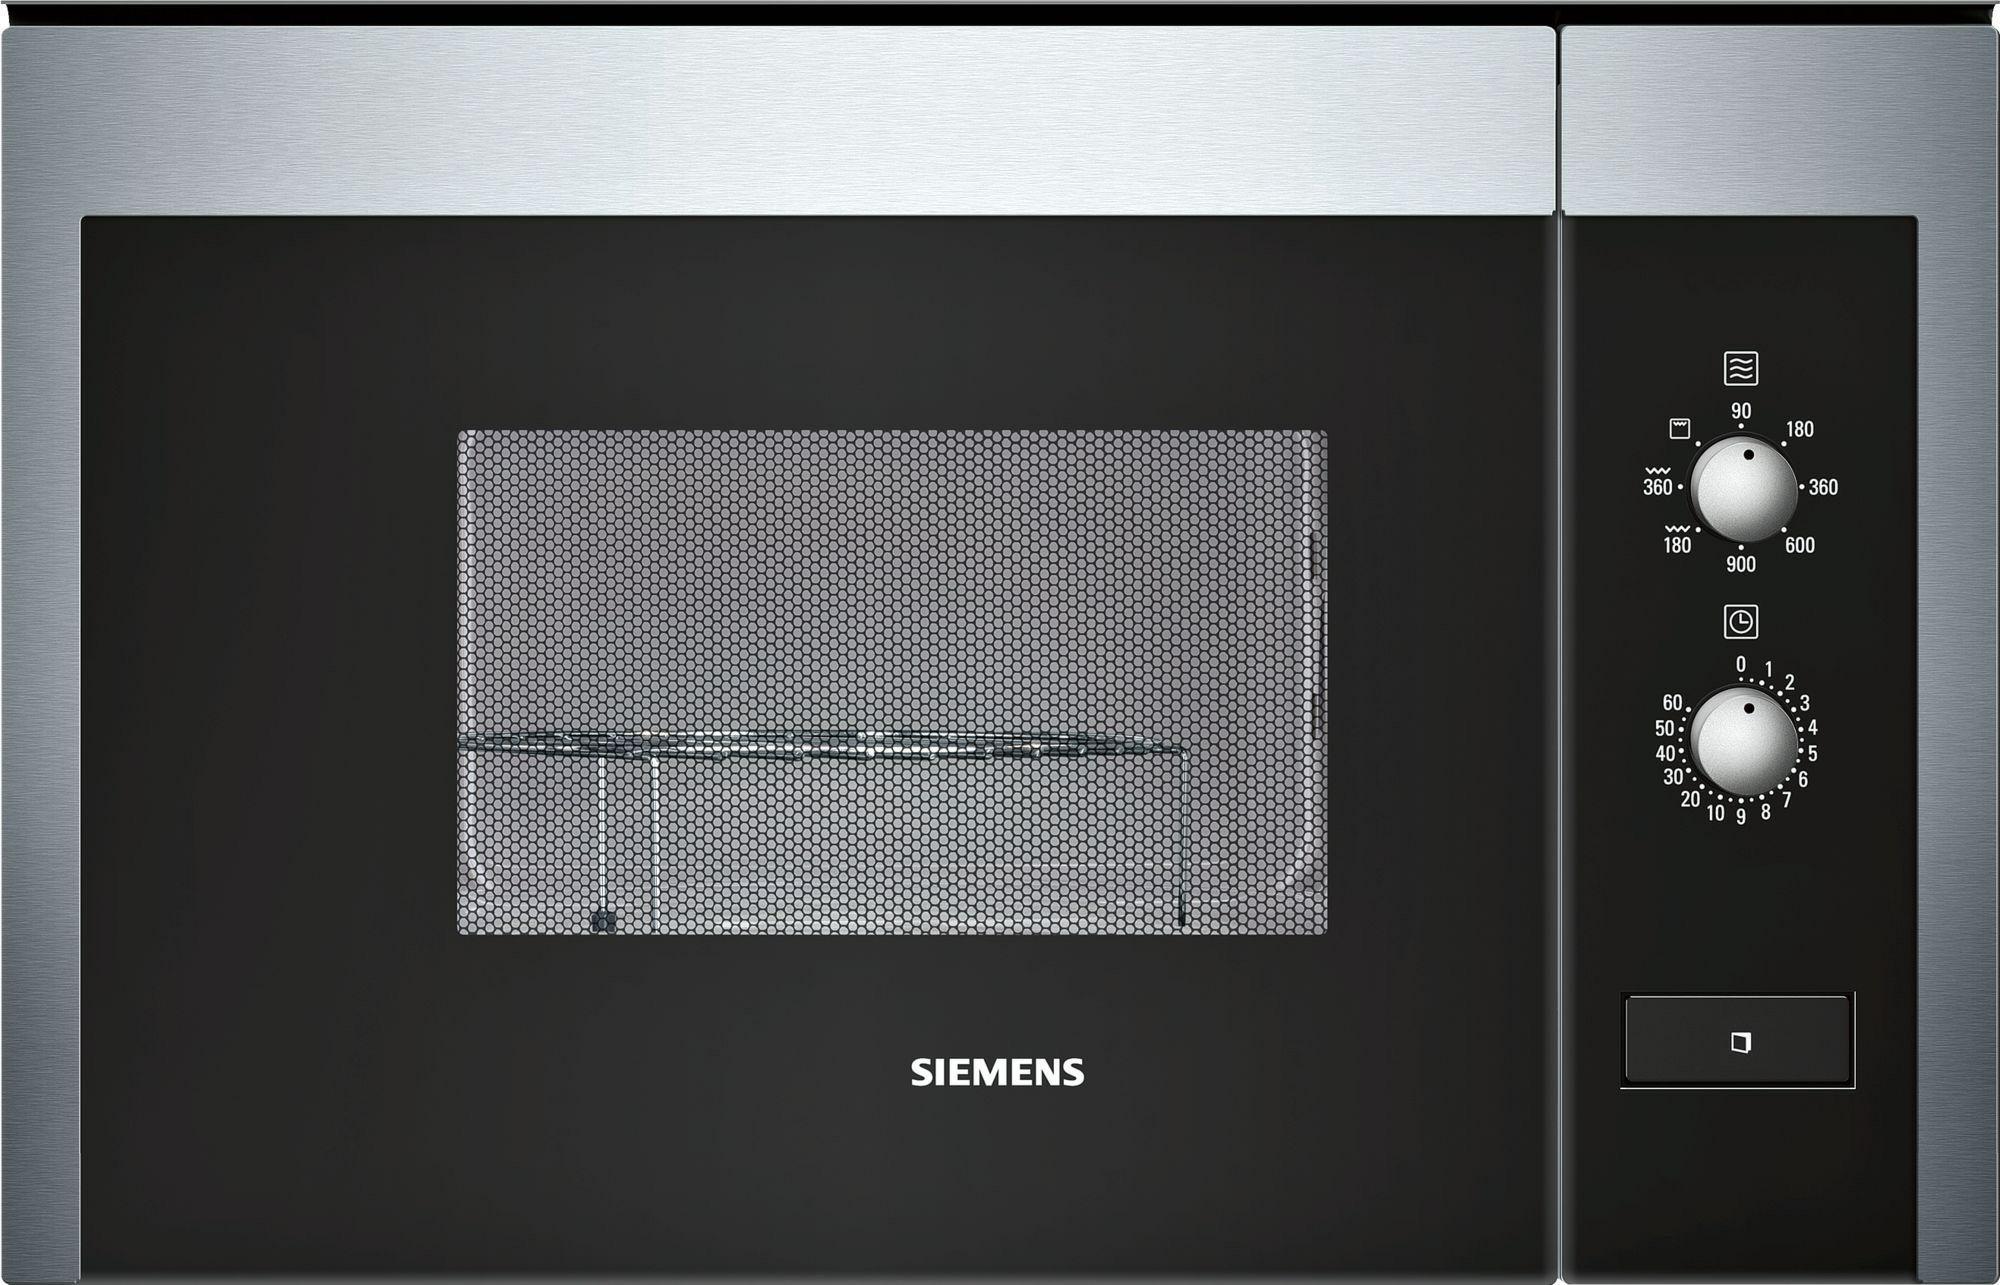 microgolfoven Siemens Promotoren HF12G564 microgolfoven microgolven met grill (inbouw) HF 12G564 HF 12 G 564